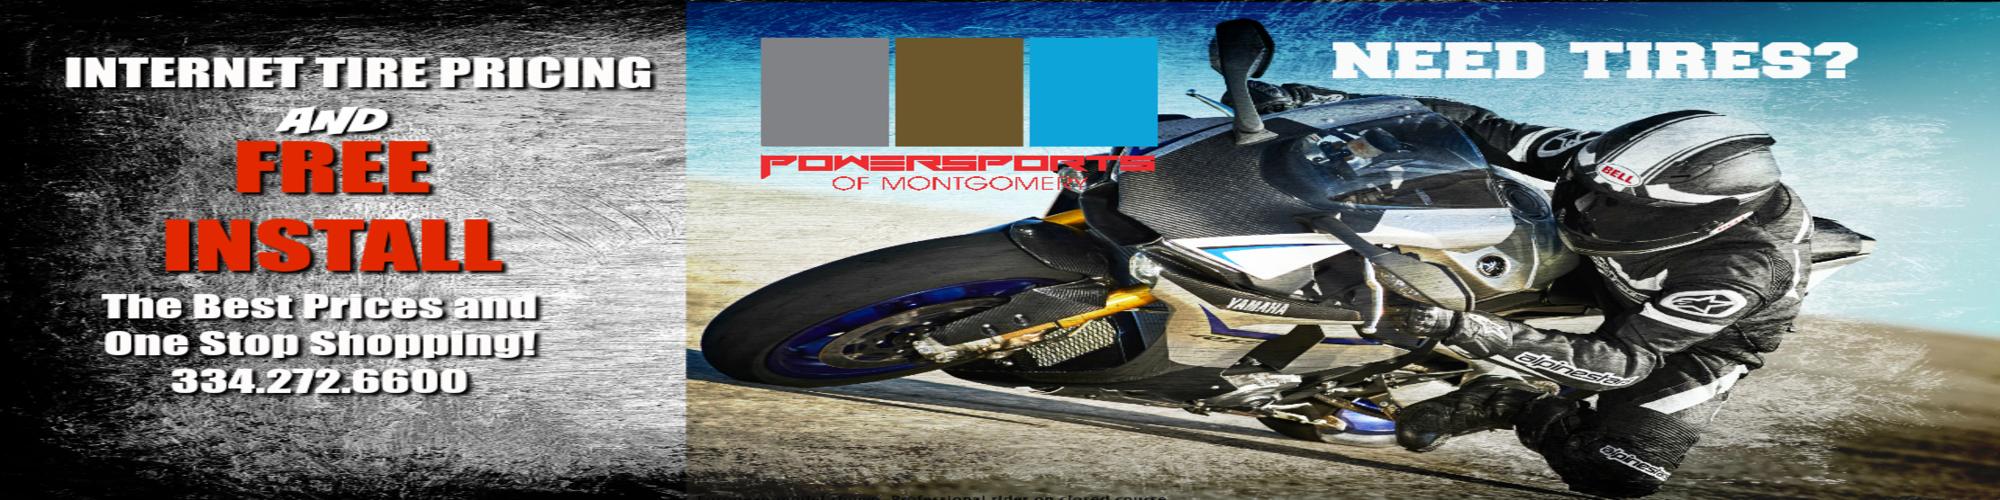 Powersports of montgomery located in montgomery al for Honda yamaha montgomery al